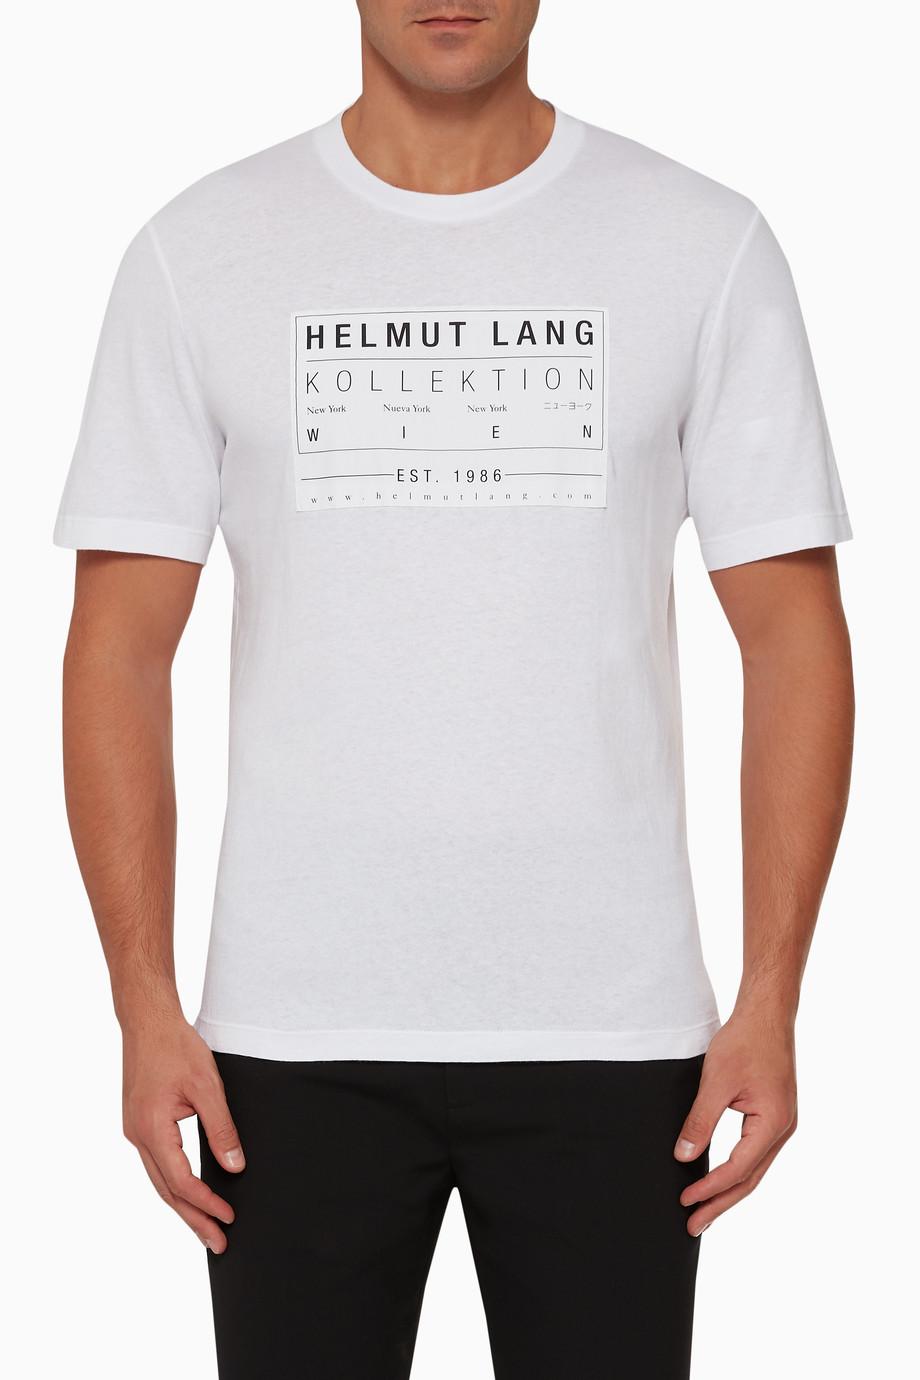 7887590e0 Shop Helmut Lang White Patch Logo Short-Sleeved T-Shirt for Men ...